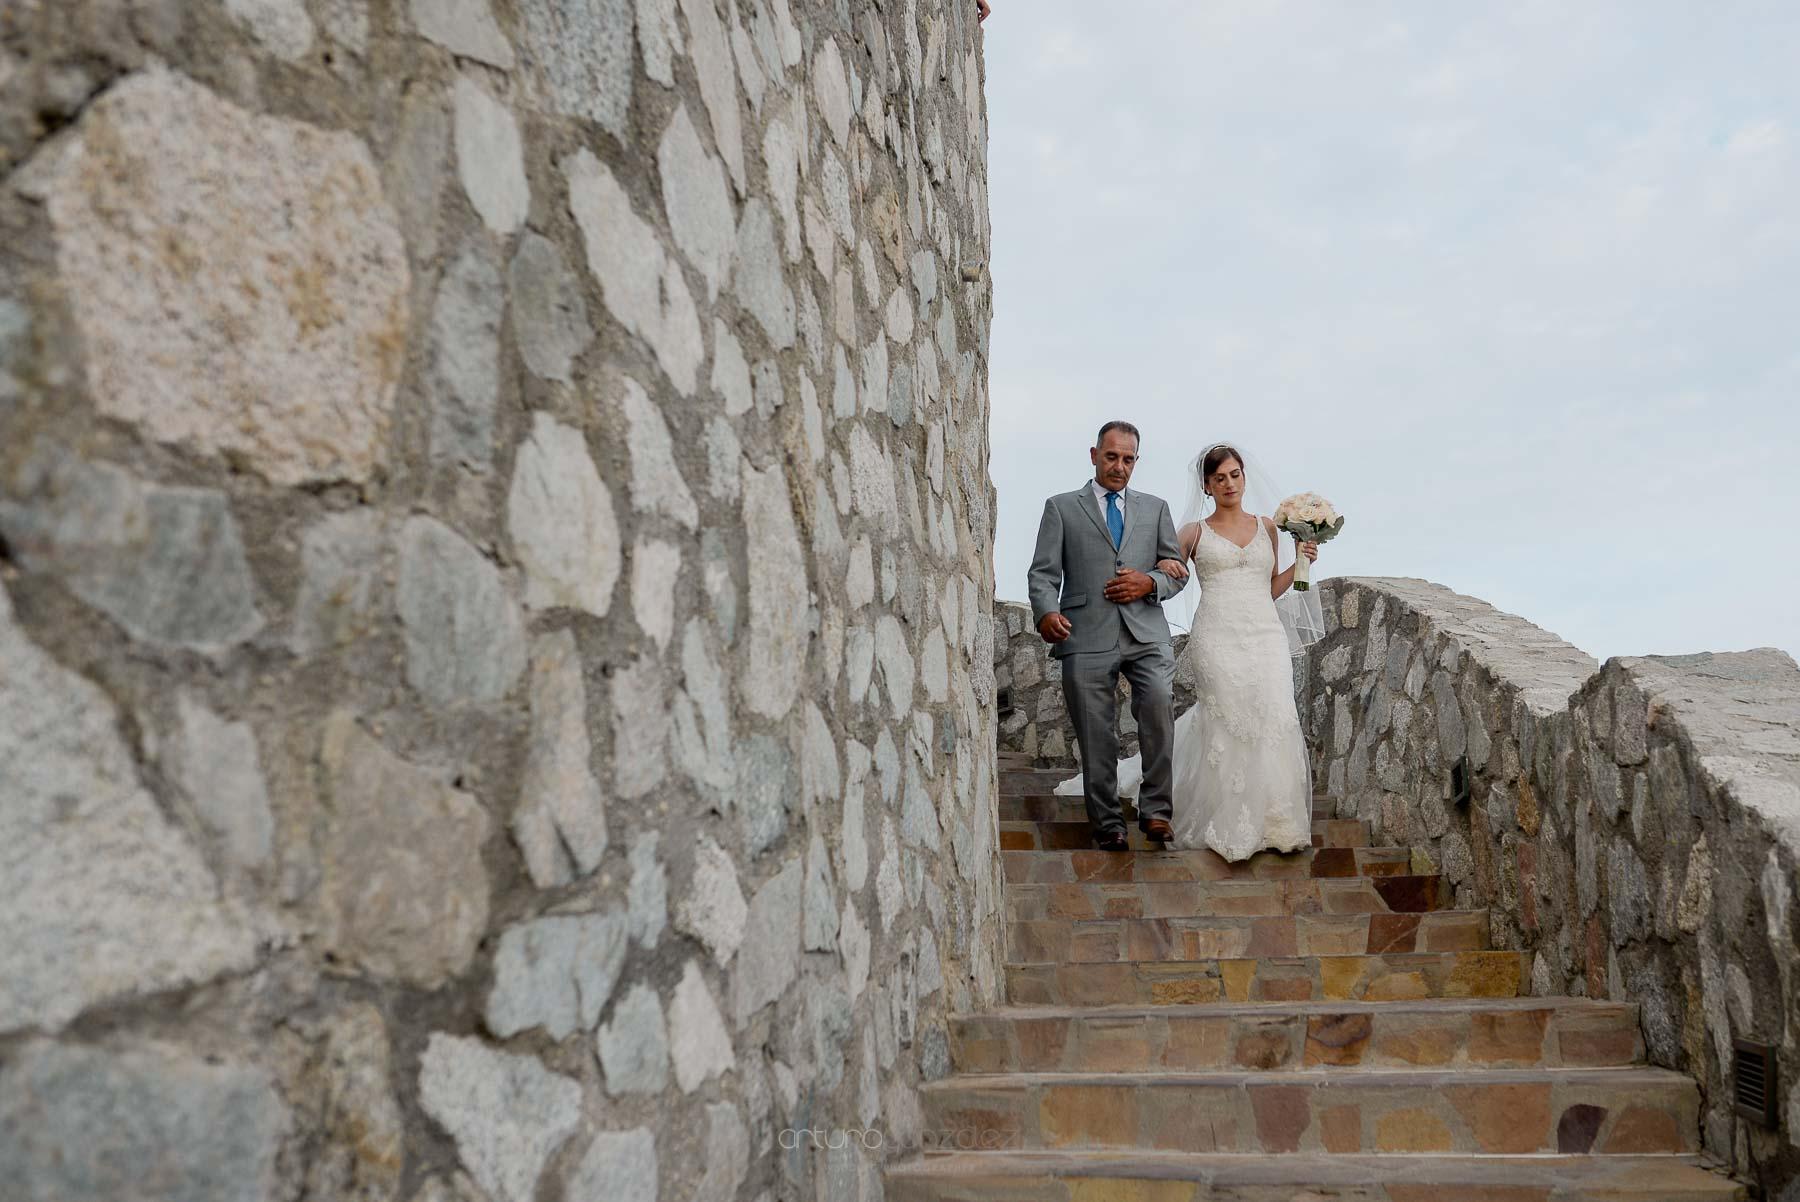 wedding-photos-pueblo-bonito-sunset-beach-4608